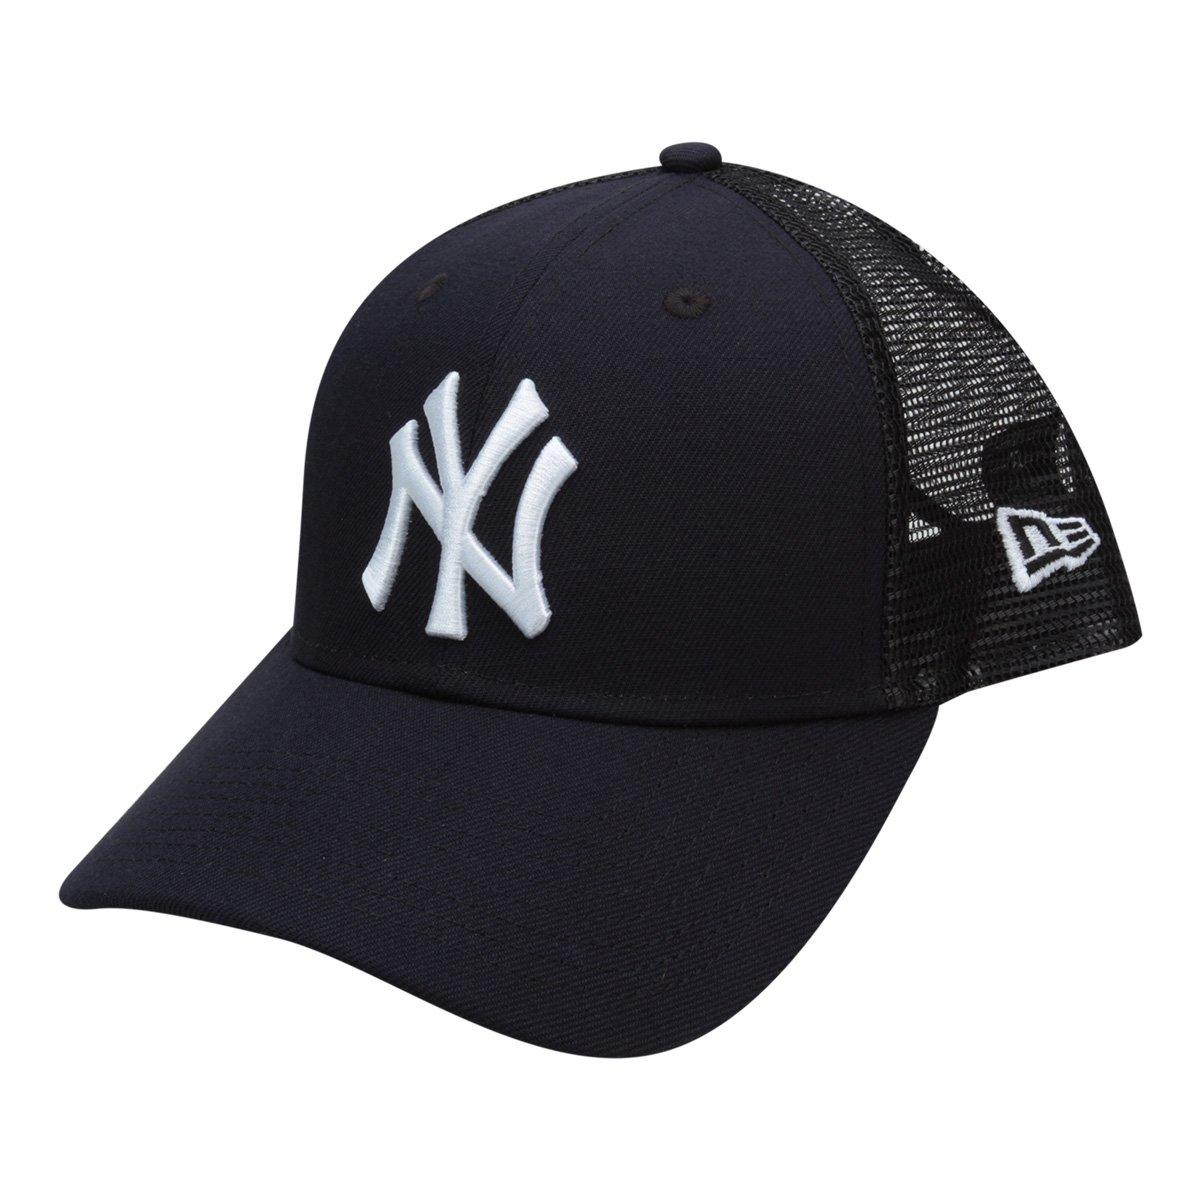 7aa3ced15ddb2 Boné New Era MLB New York Yankees Aba Curva 940 Sn Trucker - Compre Agora